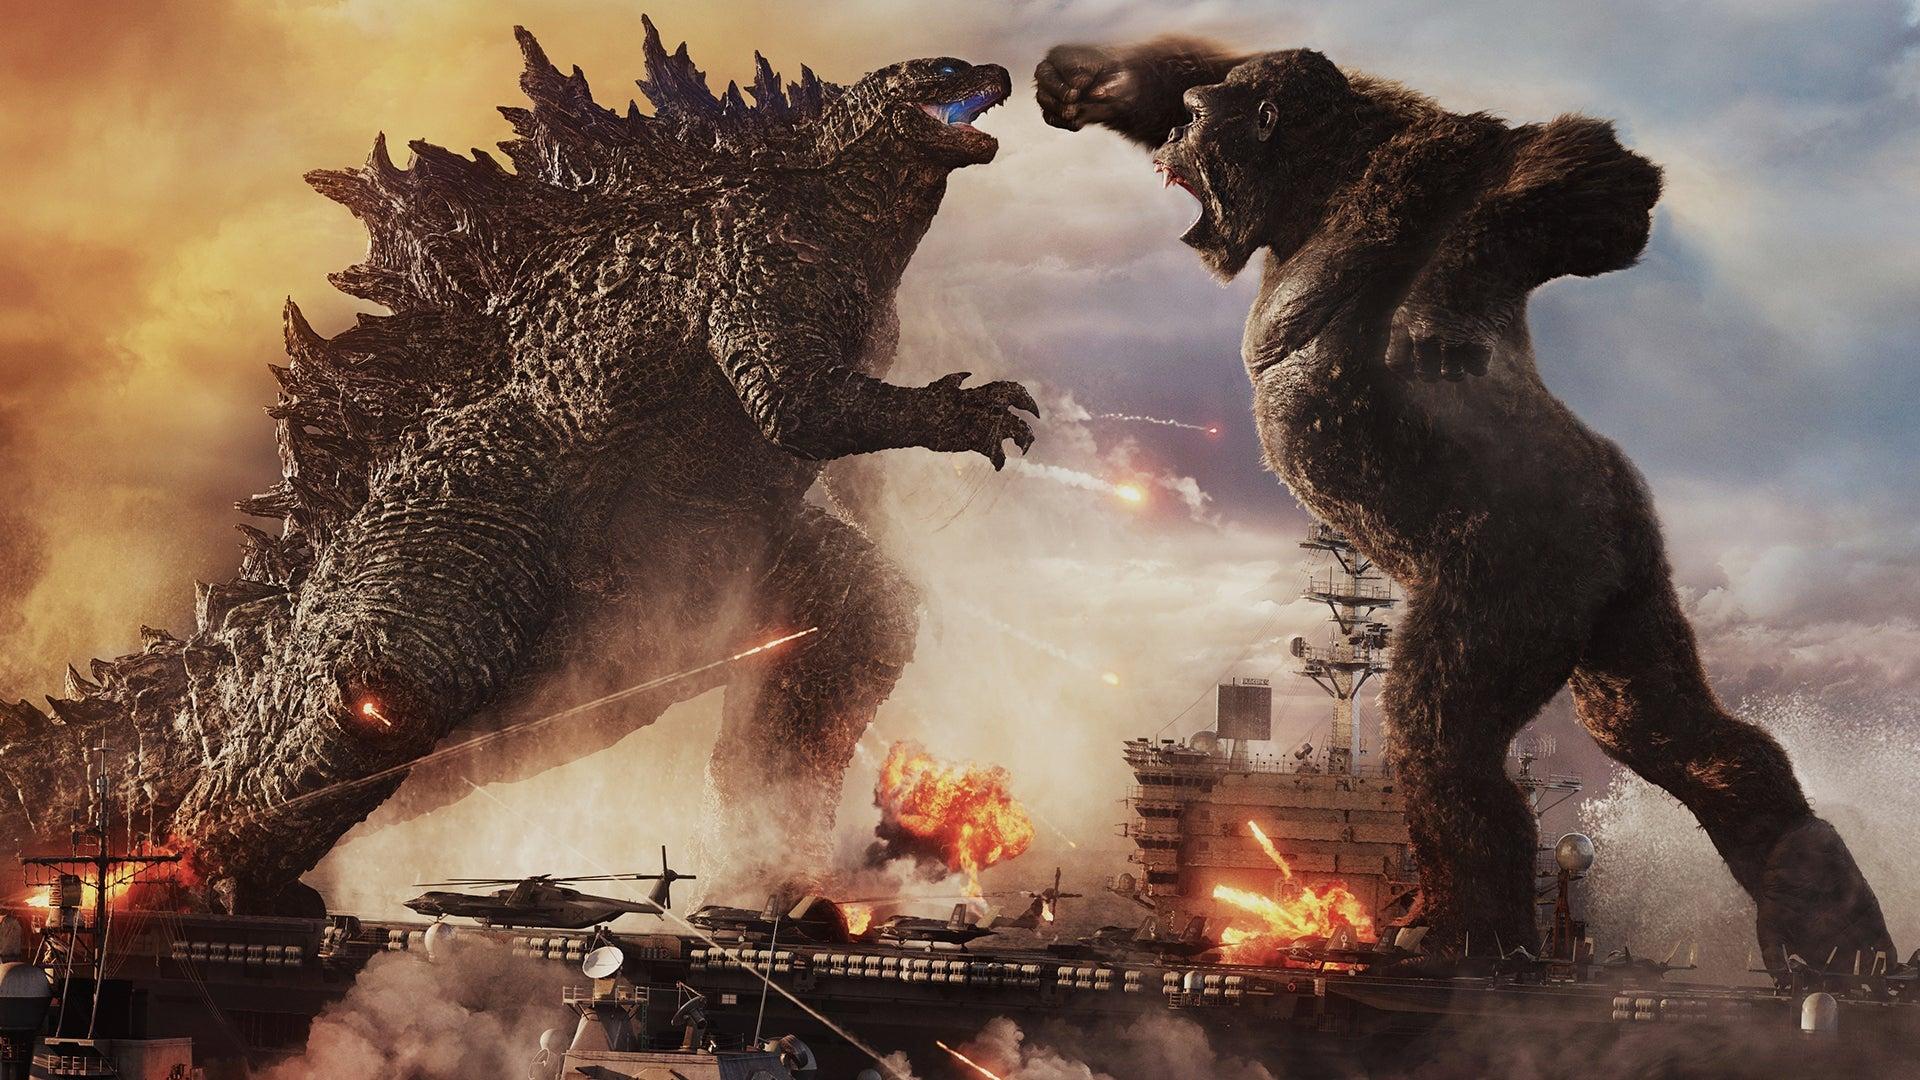 review phim godzilla vs. kong 2021 - elle man 1